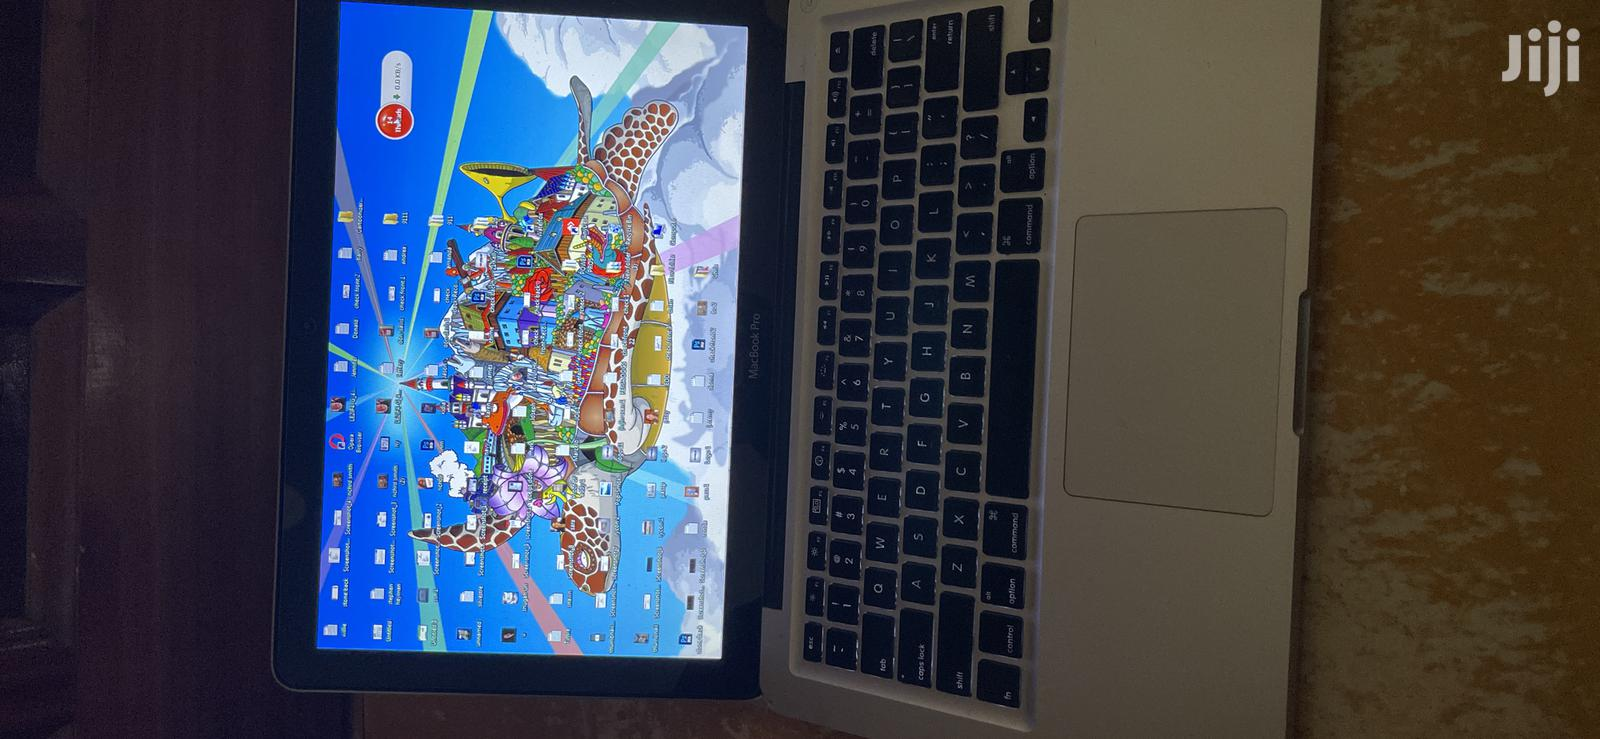 Laptop Apple MacBook Pro 4GB Intel Core 2 Duo 250GB